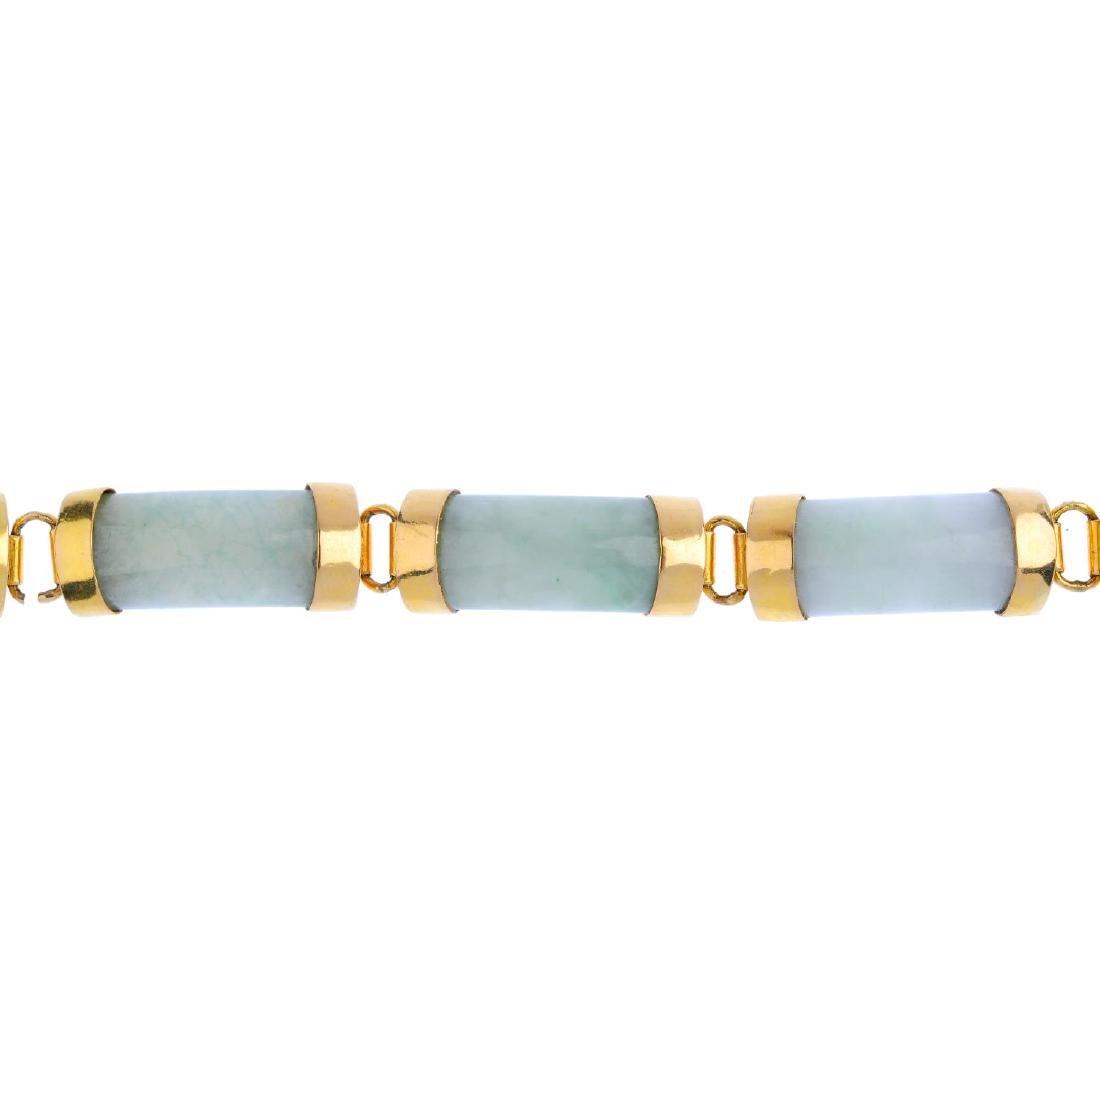 A jade bracelet. Designed as a series of curved jadeite